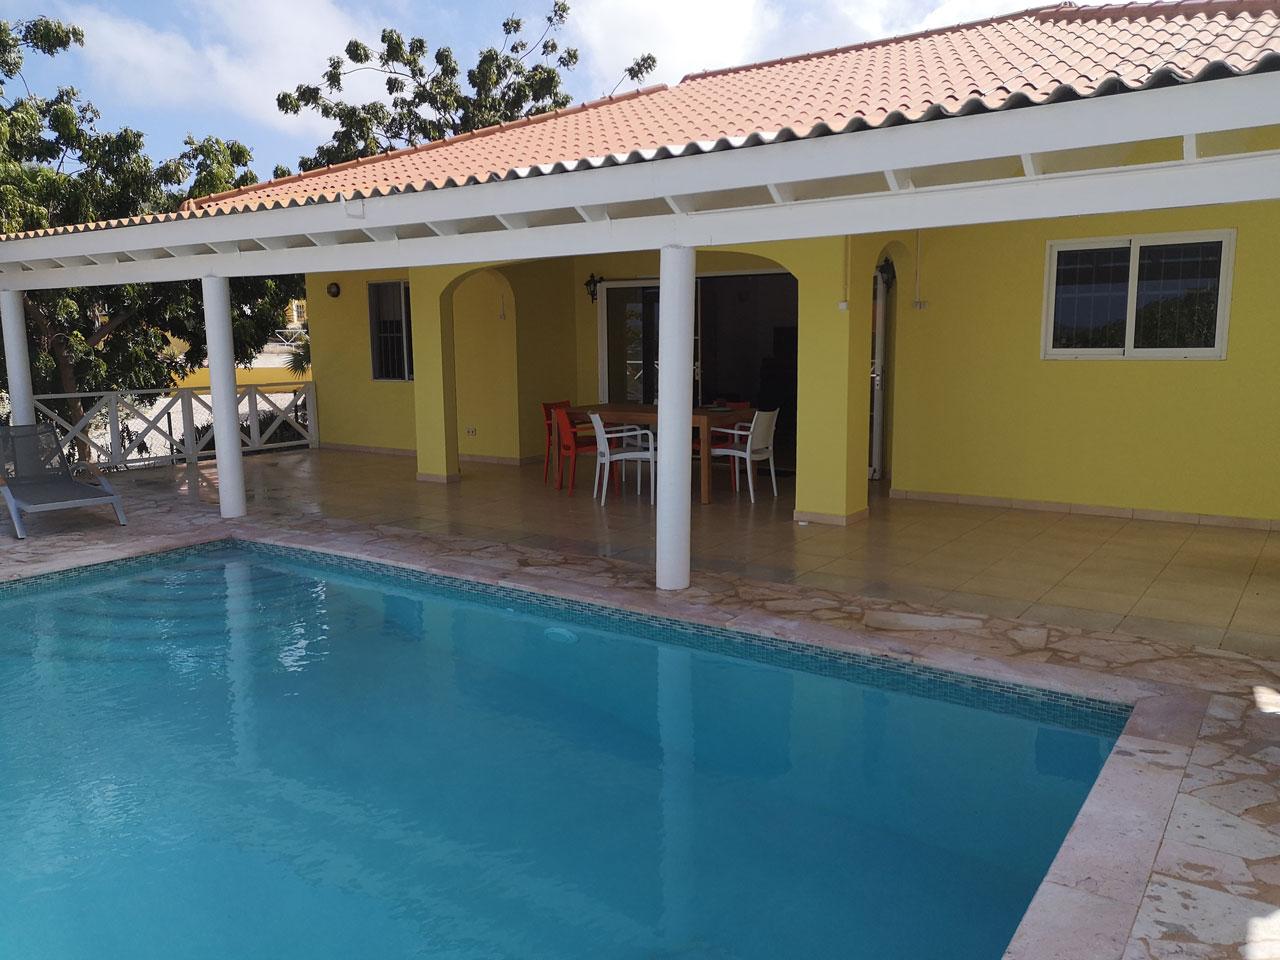 Villa Alana Curacao - Terrasse und Pool